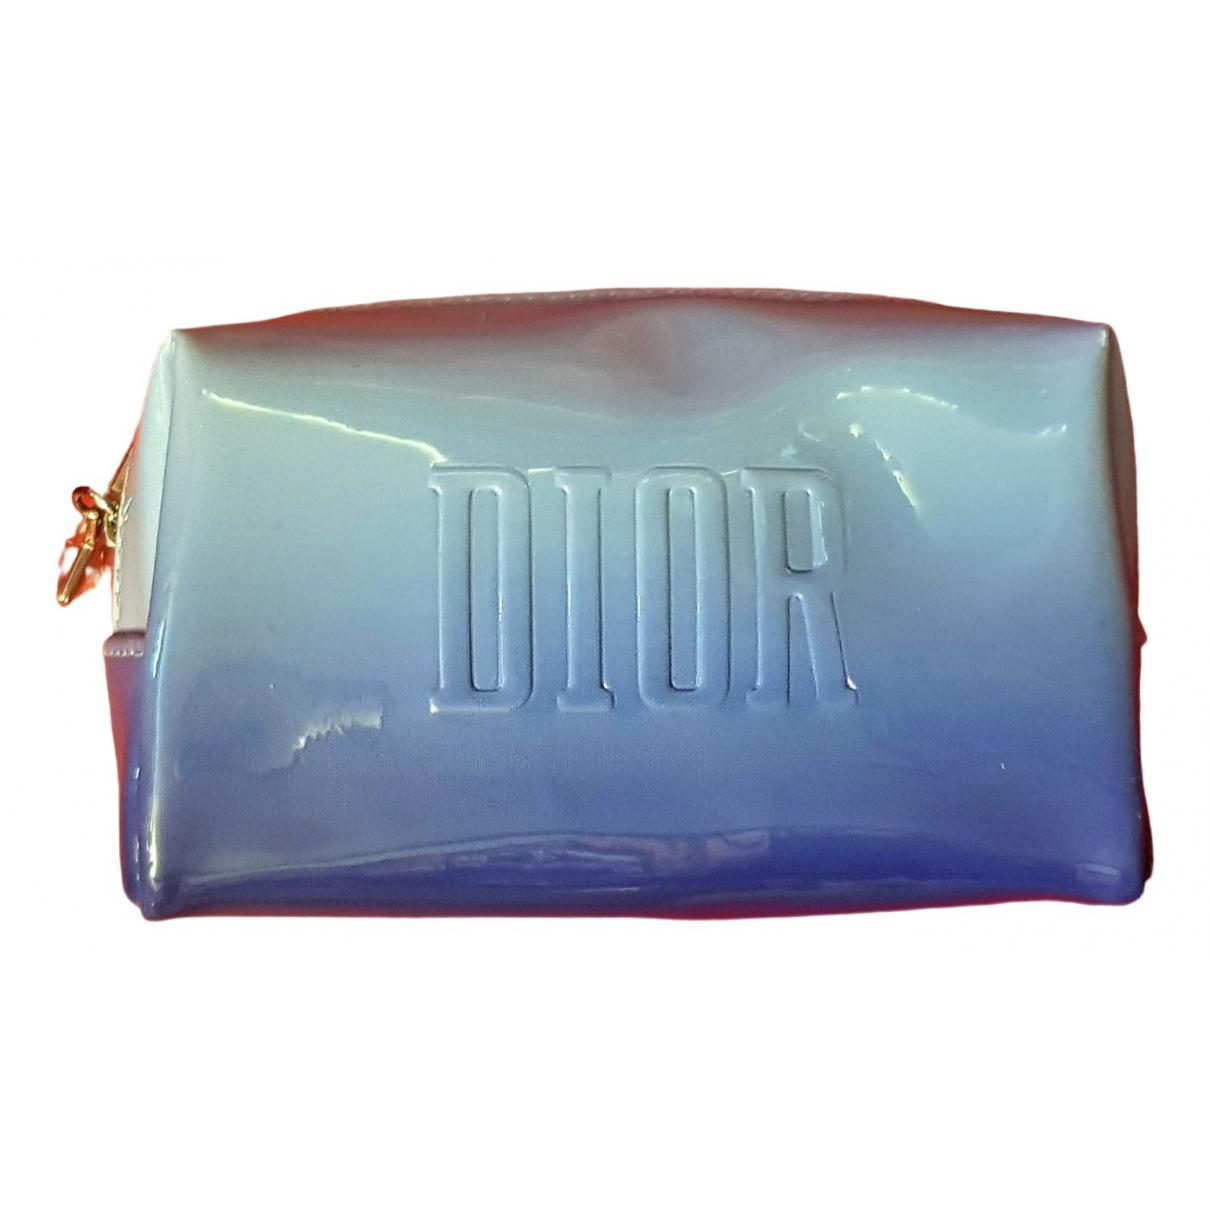 Dior - Sac de voyage   pour femme - bleu